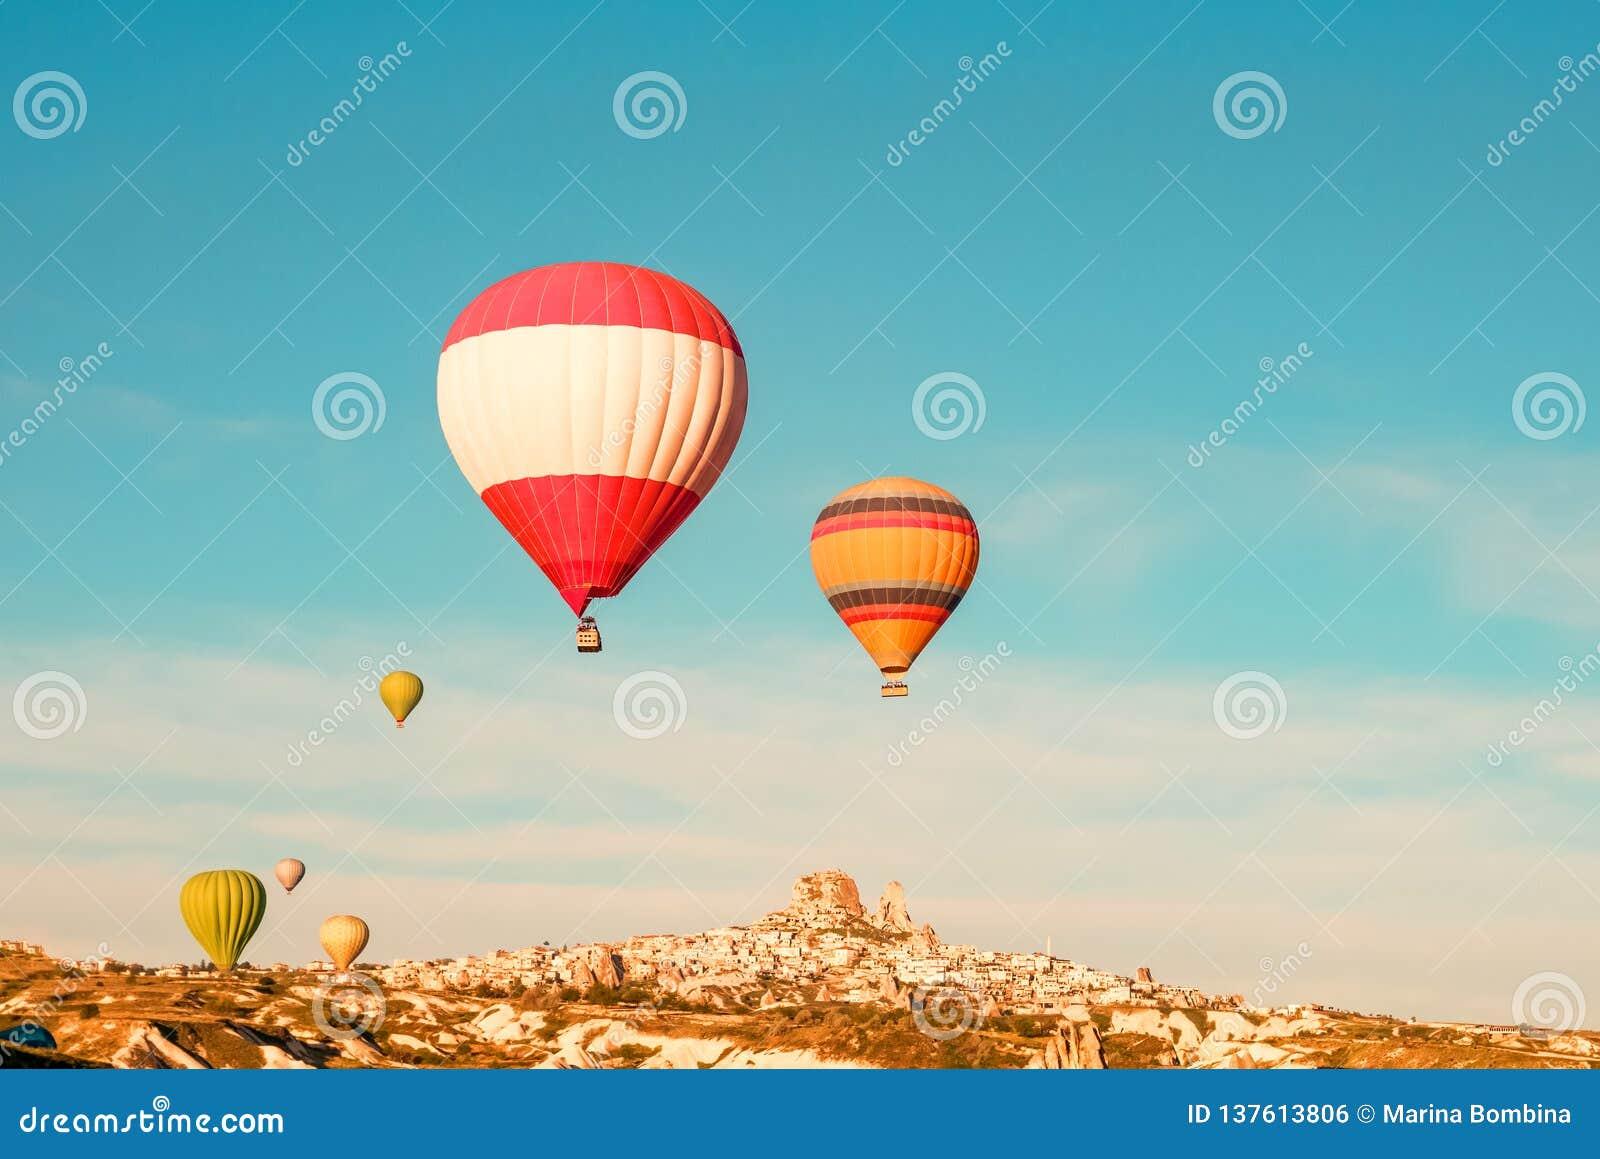 Colorful hot air balloons flying near Uchisar castle at sunrise, Cappadocia, Turkey